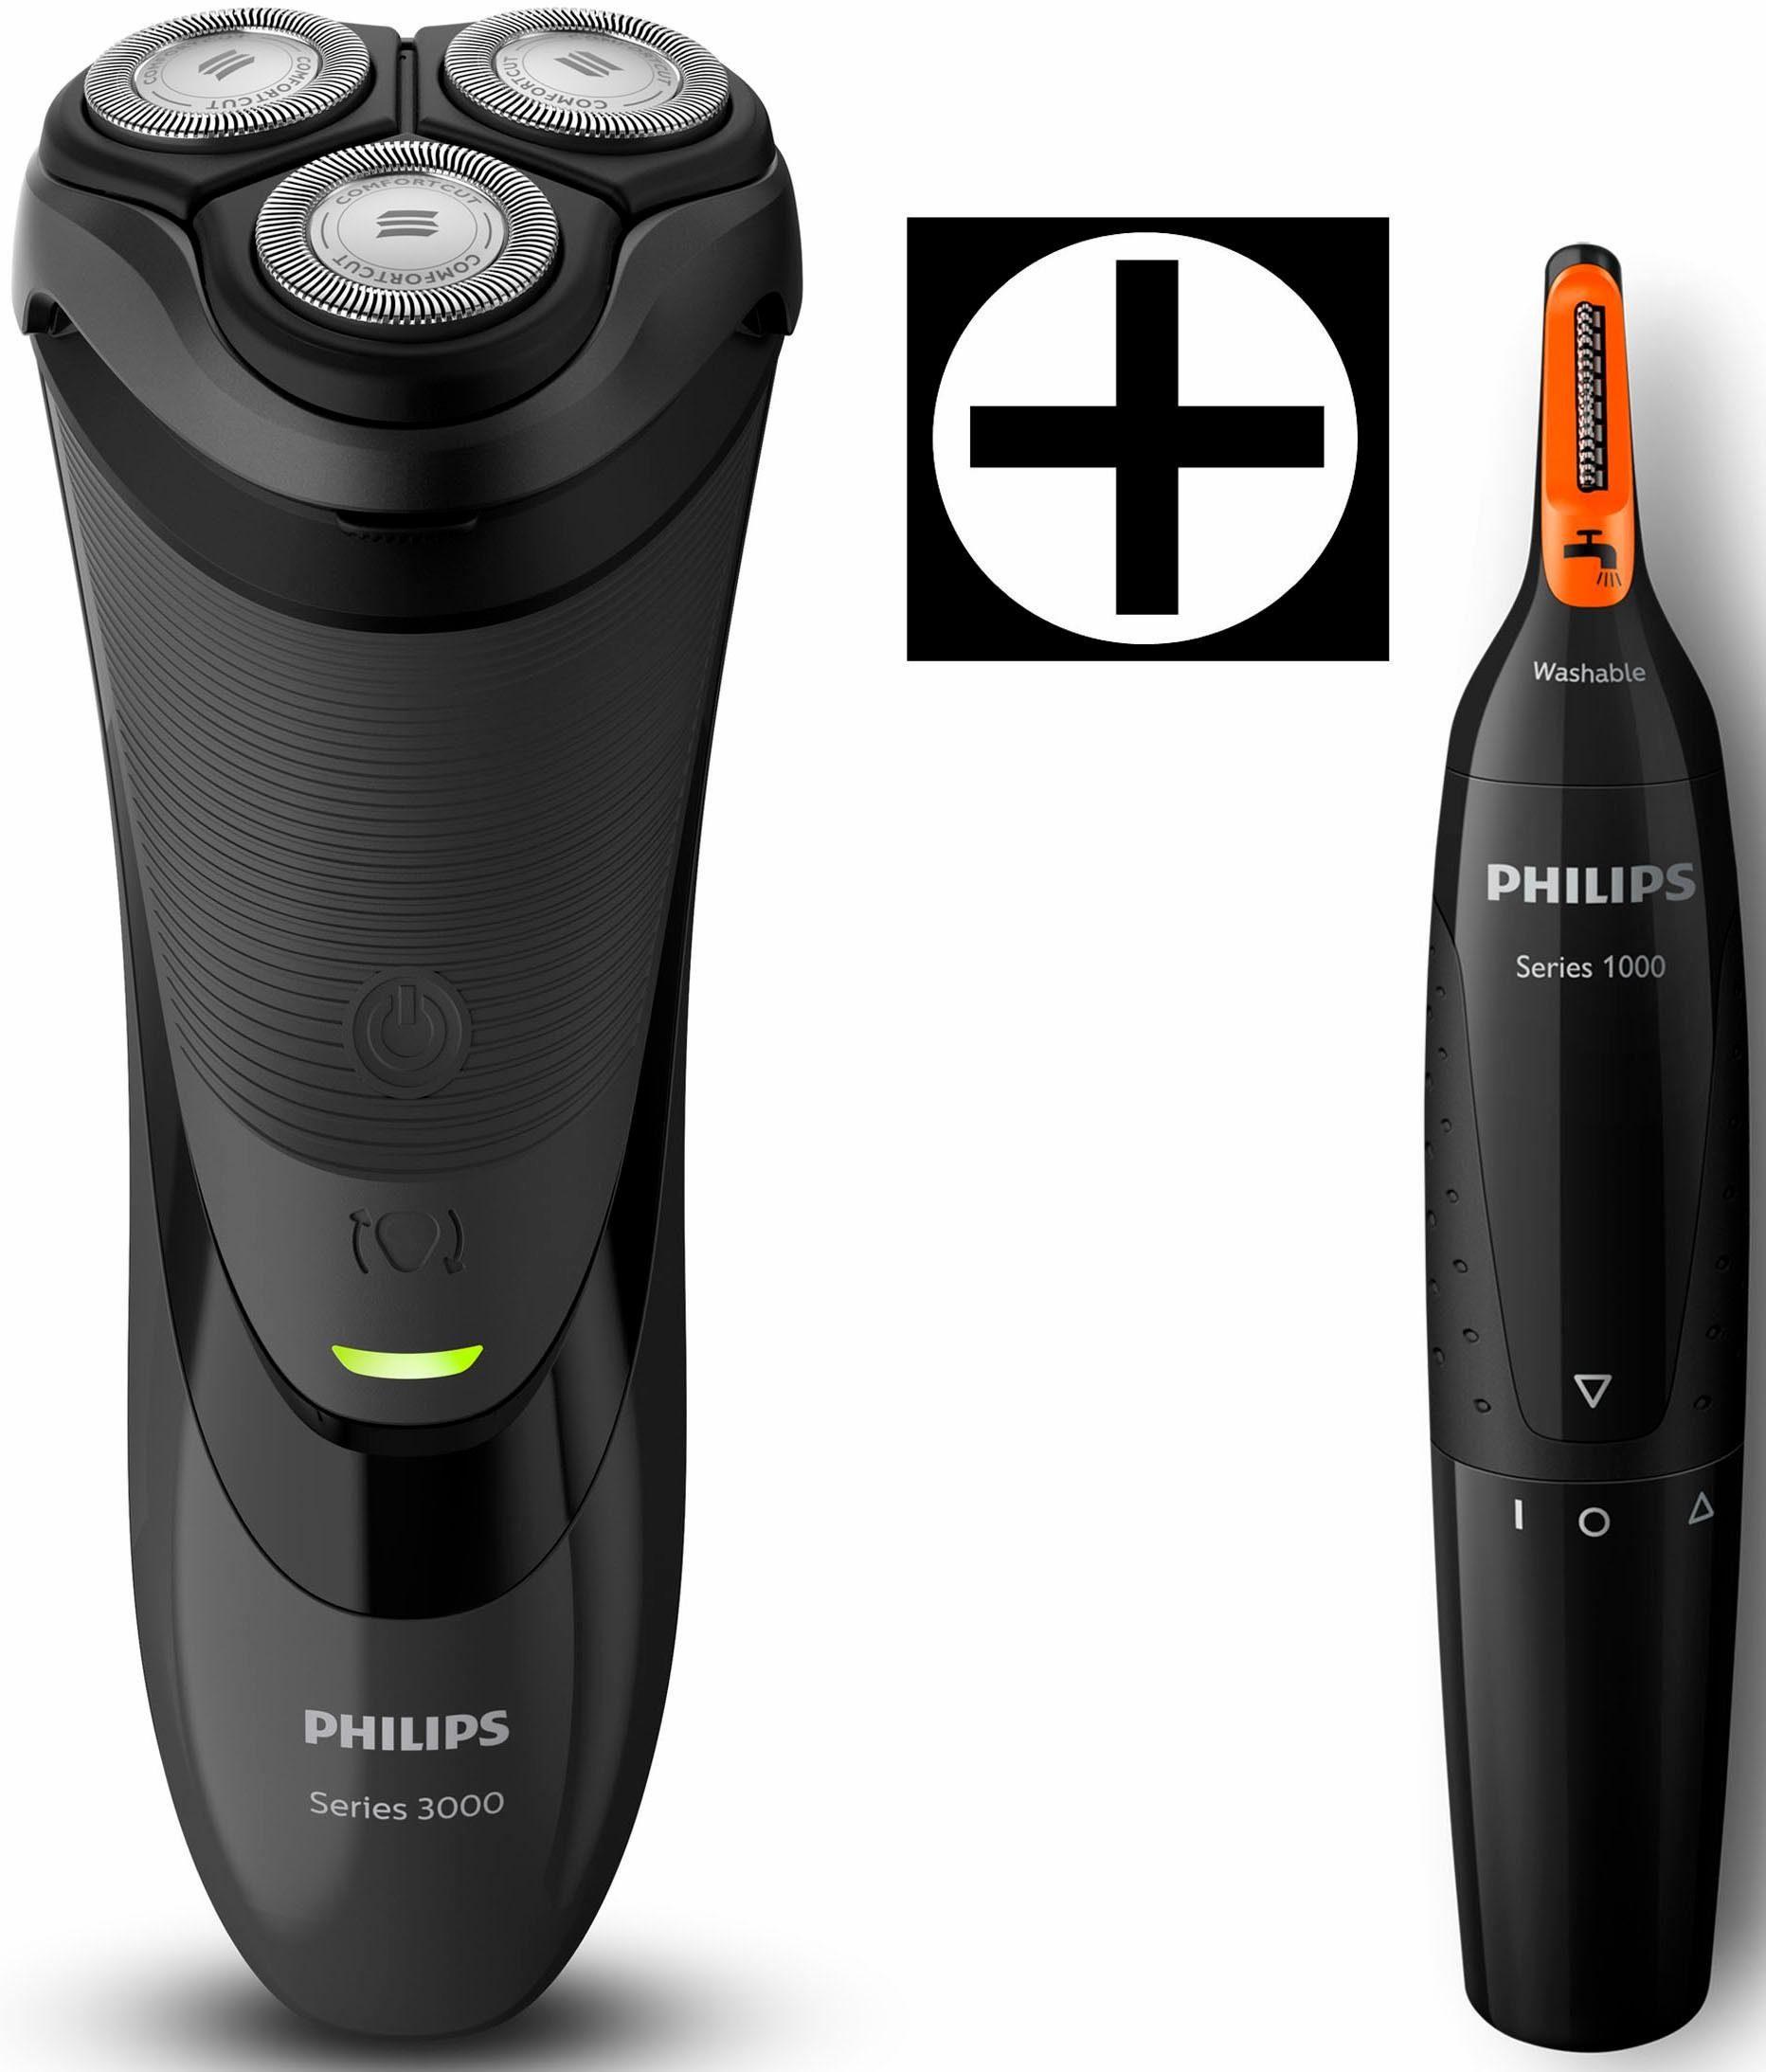 Philips Rasierer Series 3000 S3110/41, Akku/Netz, ComfortCut, inkl. Nasen- und Ohrhaartrimmer